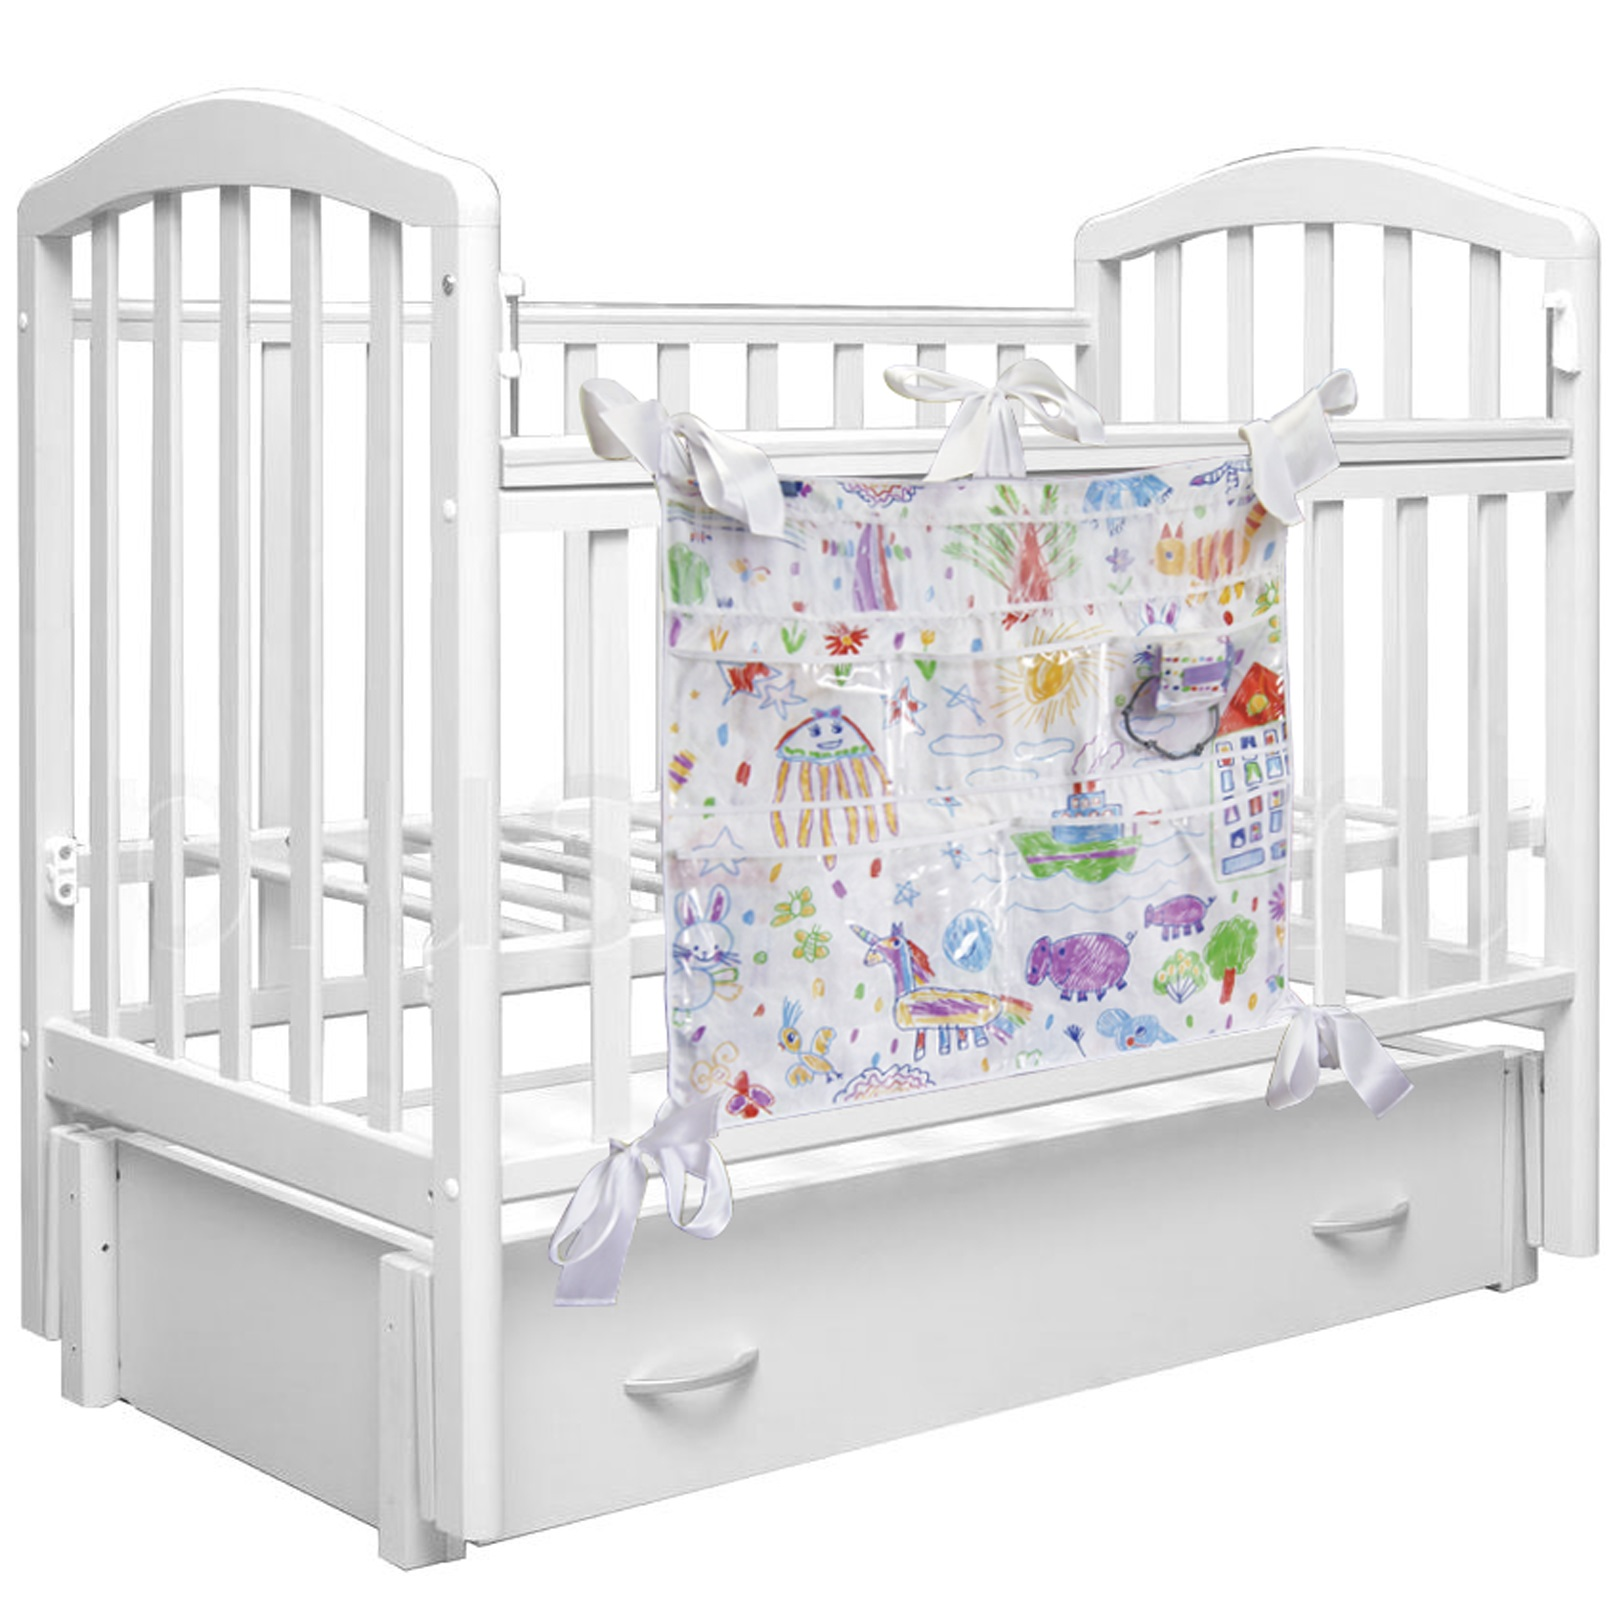 Аксессуары для кроваток Вит-Фит Органайзер на кроватку Вит-Фит «Каляки-Маляки» 63х60 см цена 2017